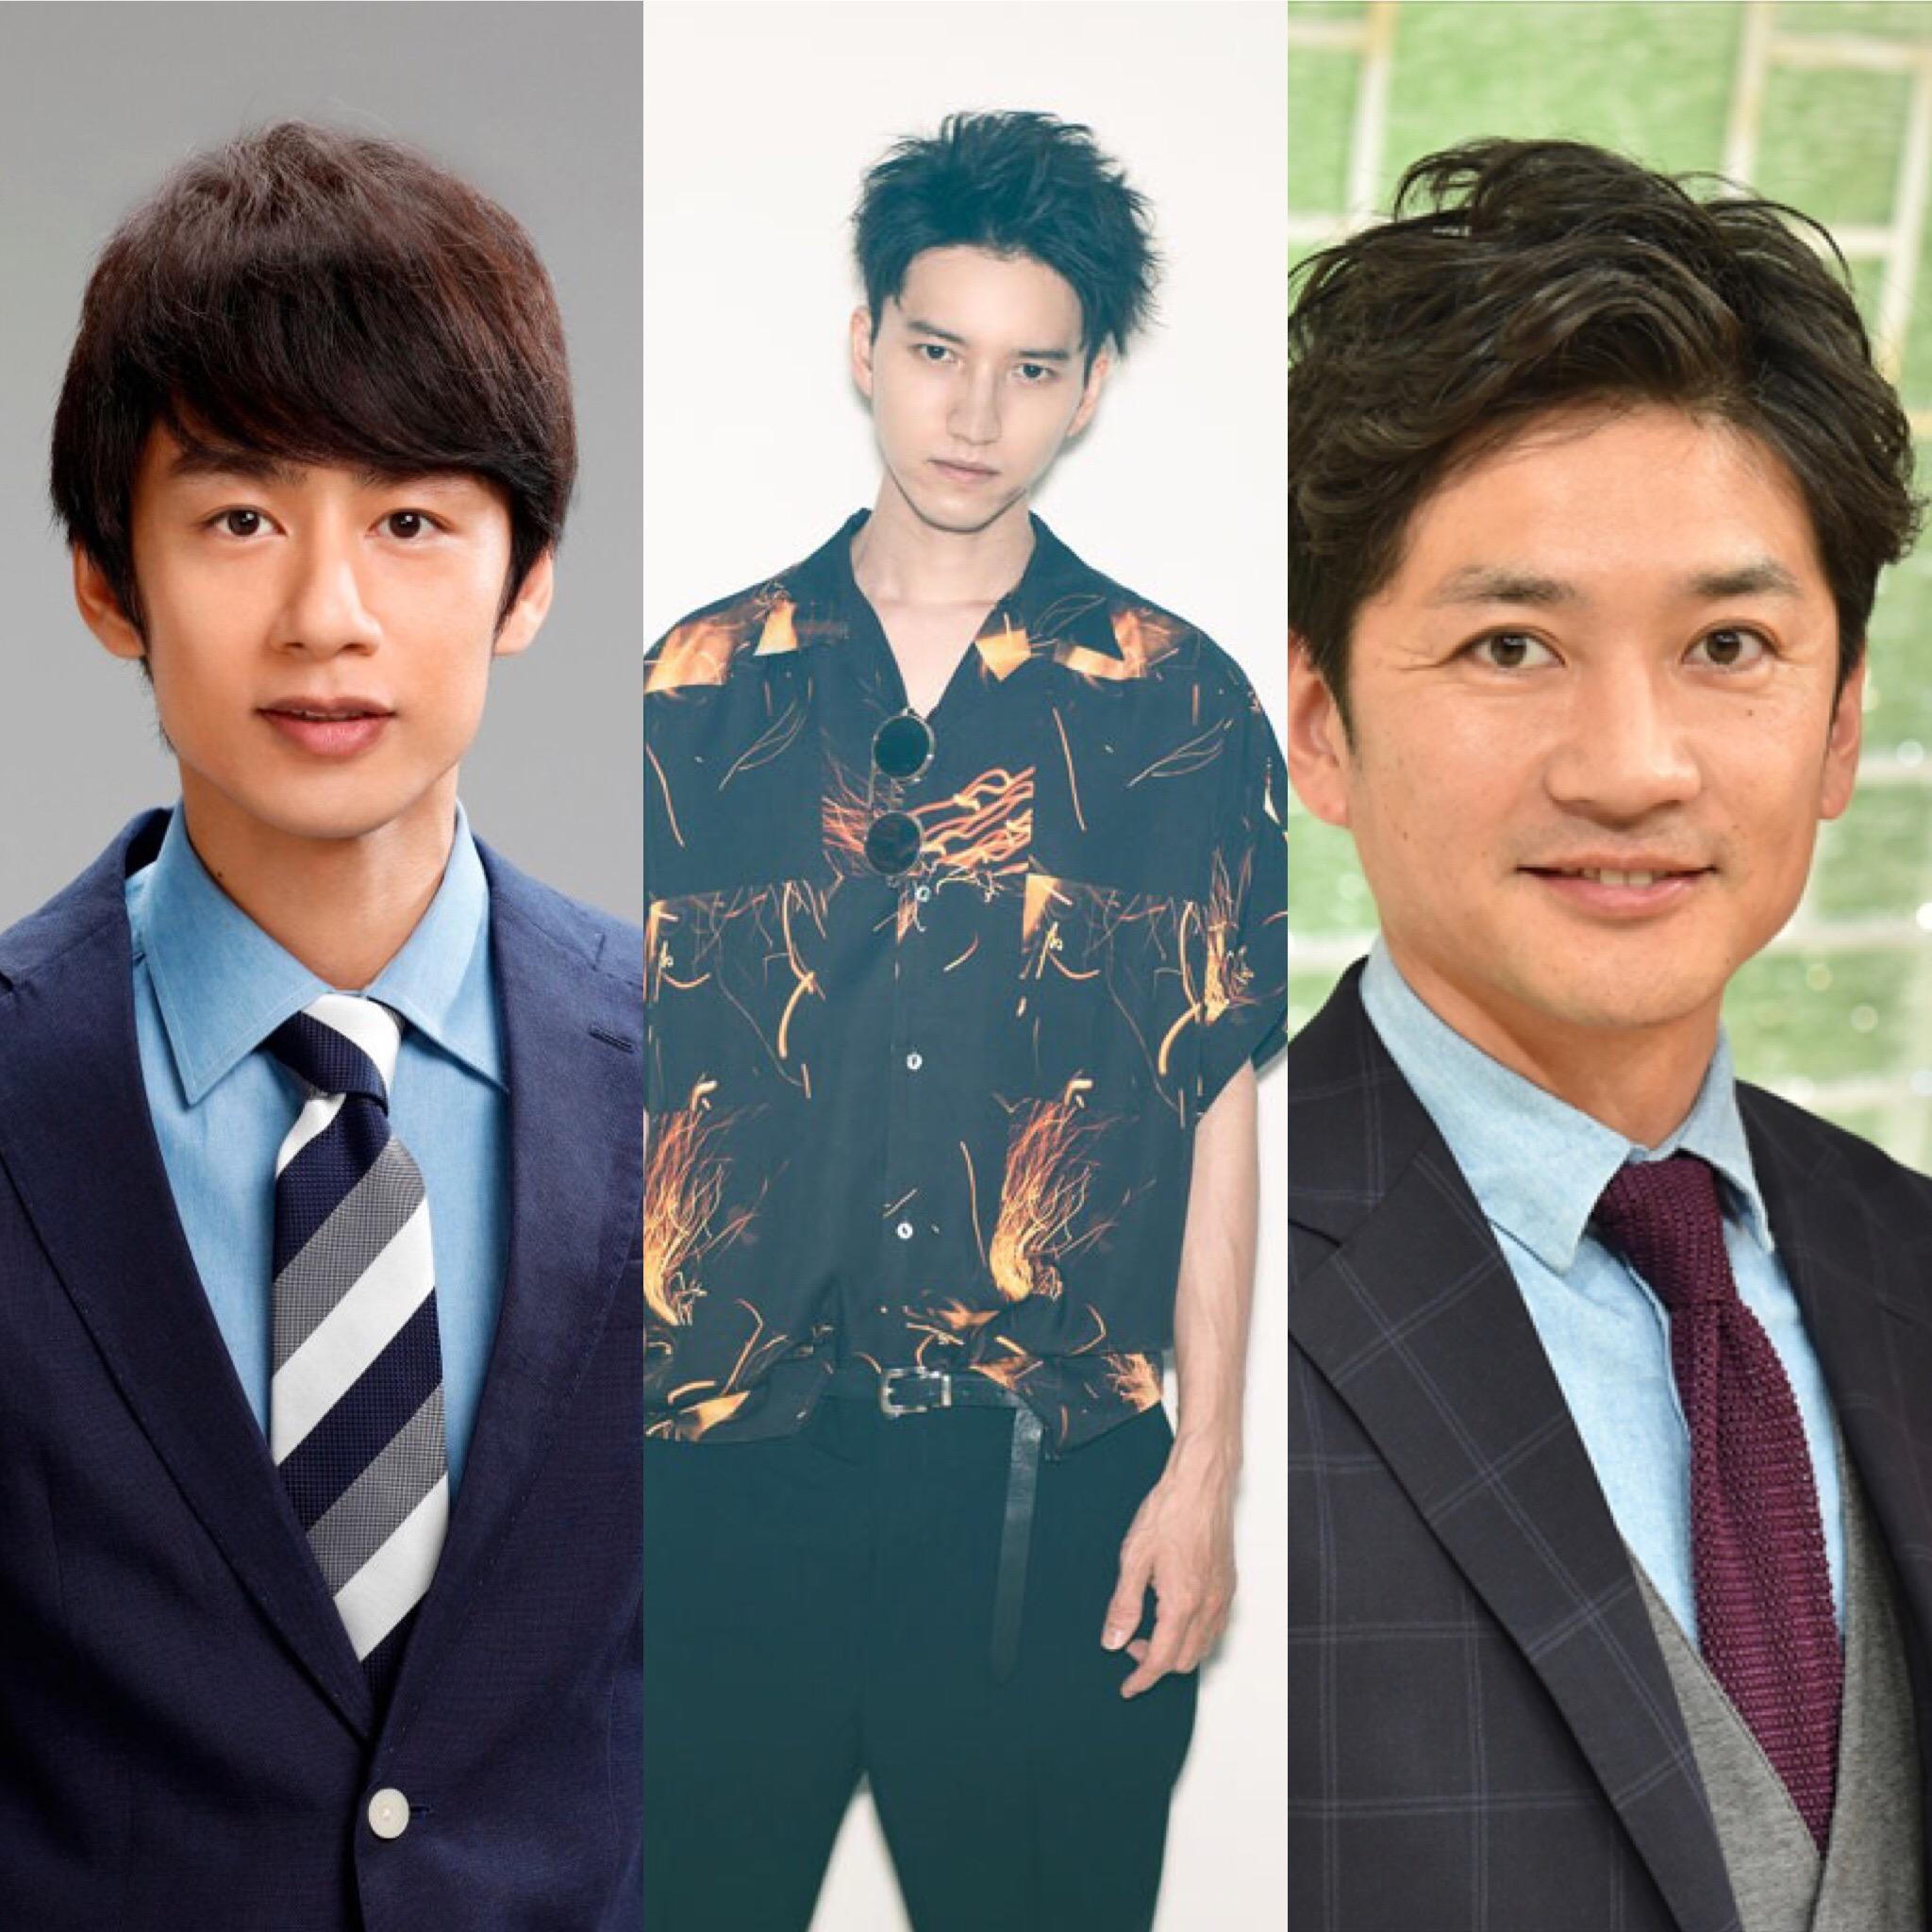 Yuichi Nakamaru & Taichi Kokubun comment on Junnosuke Taguchi's arrest